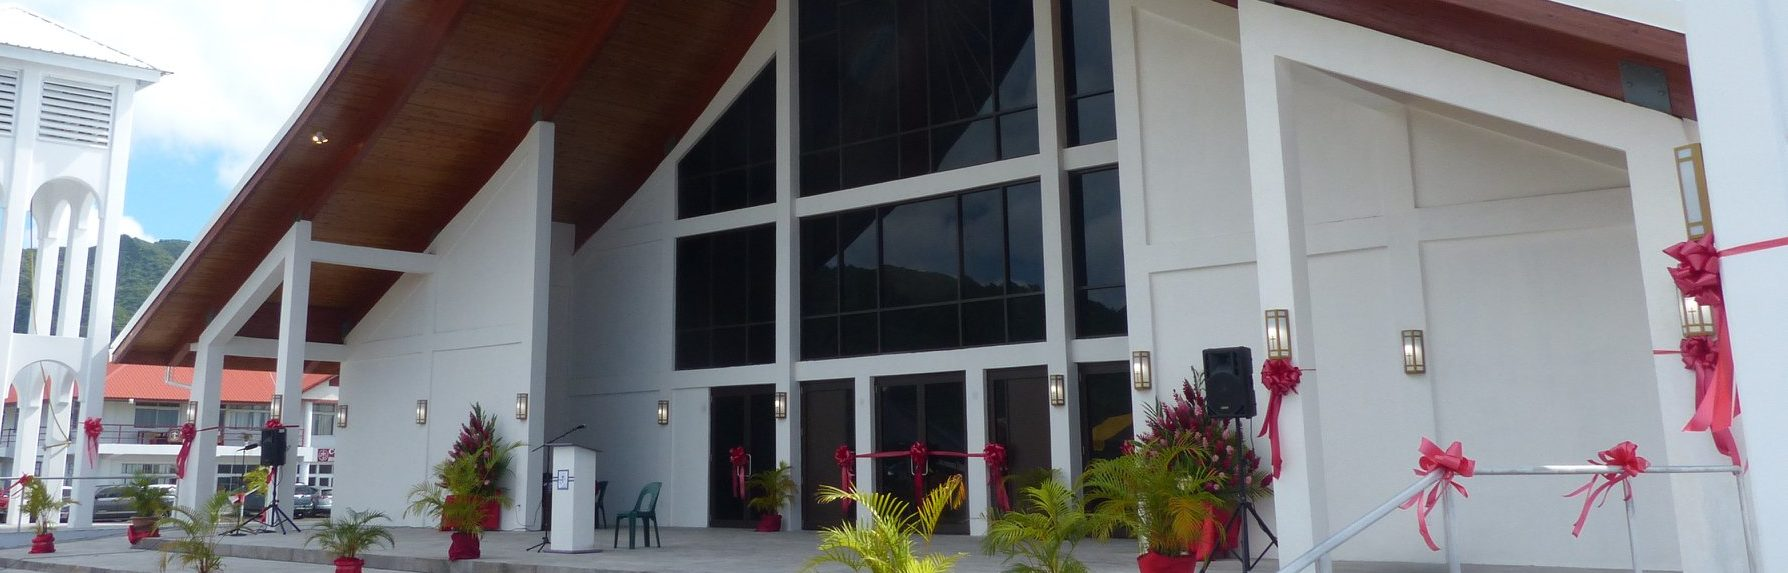 Ekalesia Faapotopotoga Kerisiano Amerika Samoa (EFKAS)